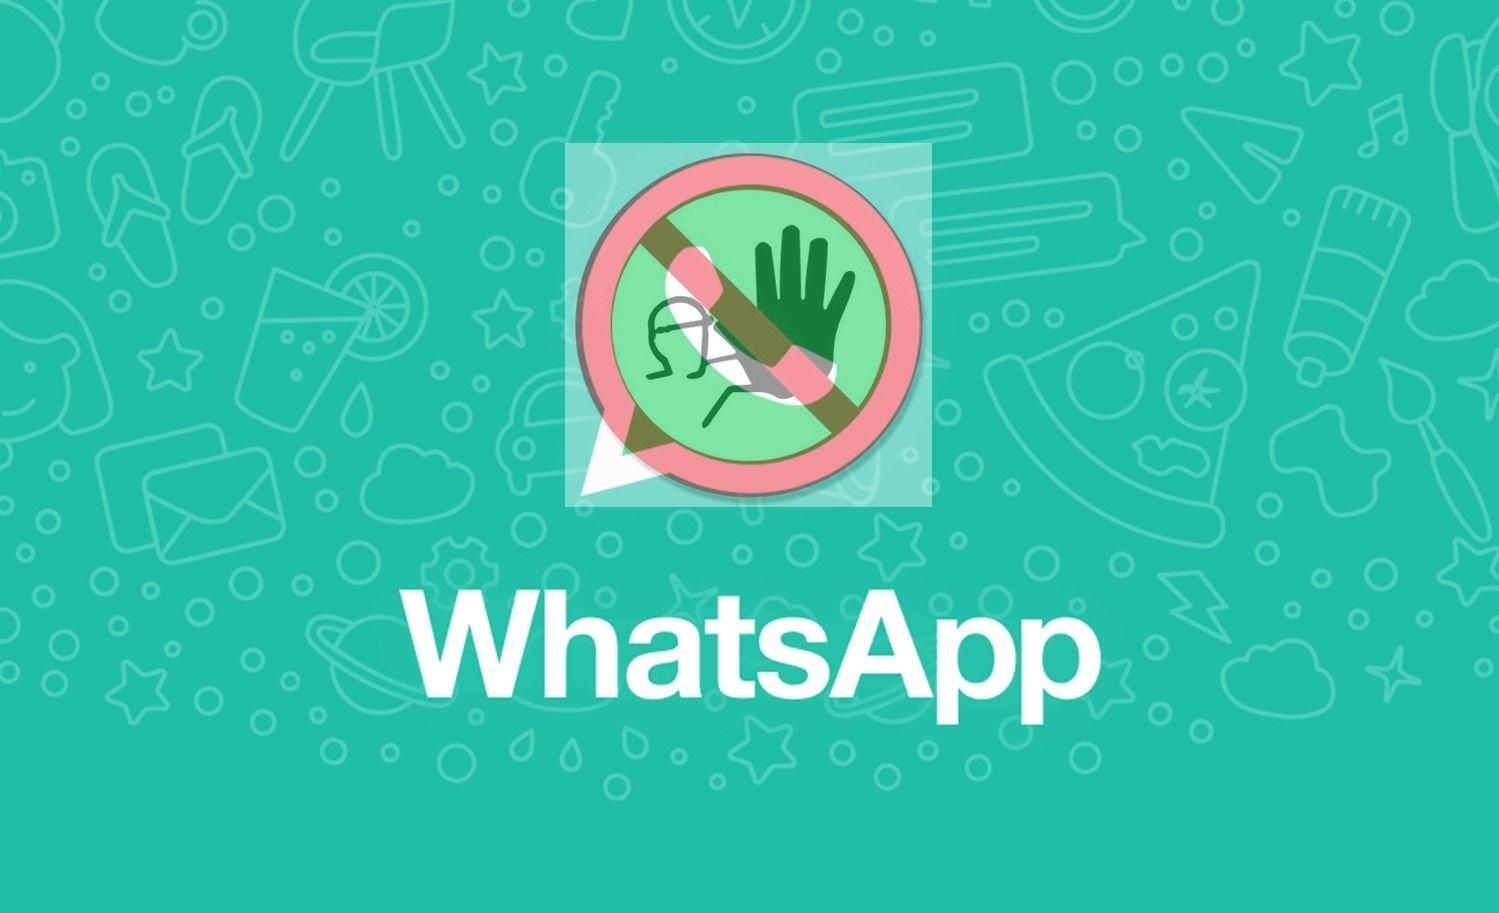 Persona bloqueada en Whatsapp